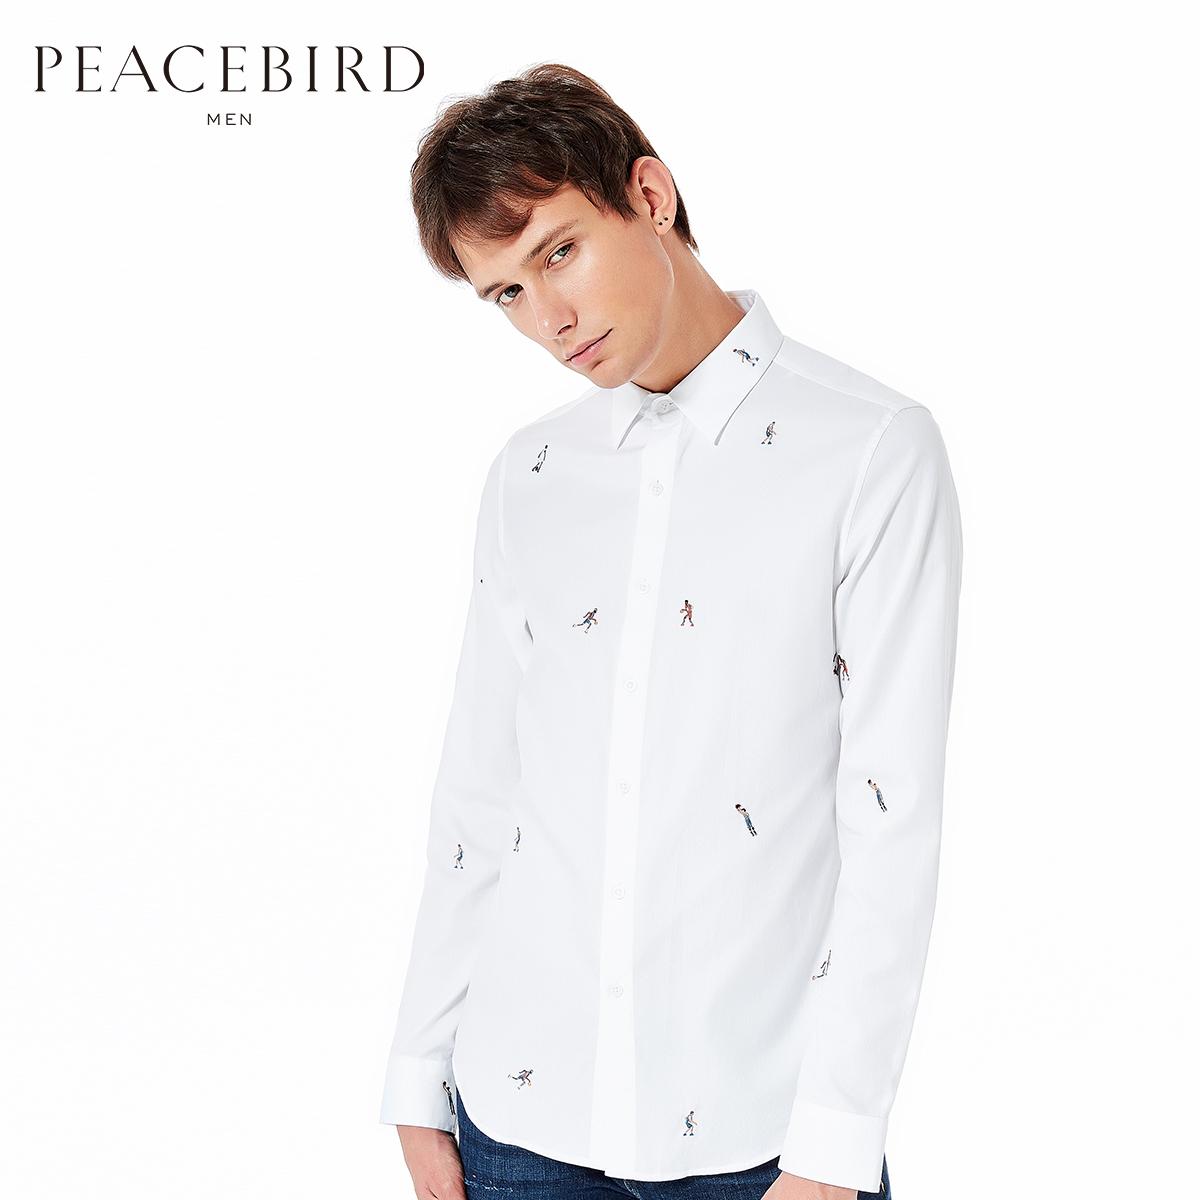 Usd 15100 X Pacific Bird Mens Long Sleeved Shirt Mens Spring And